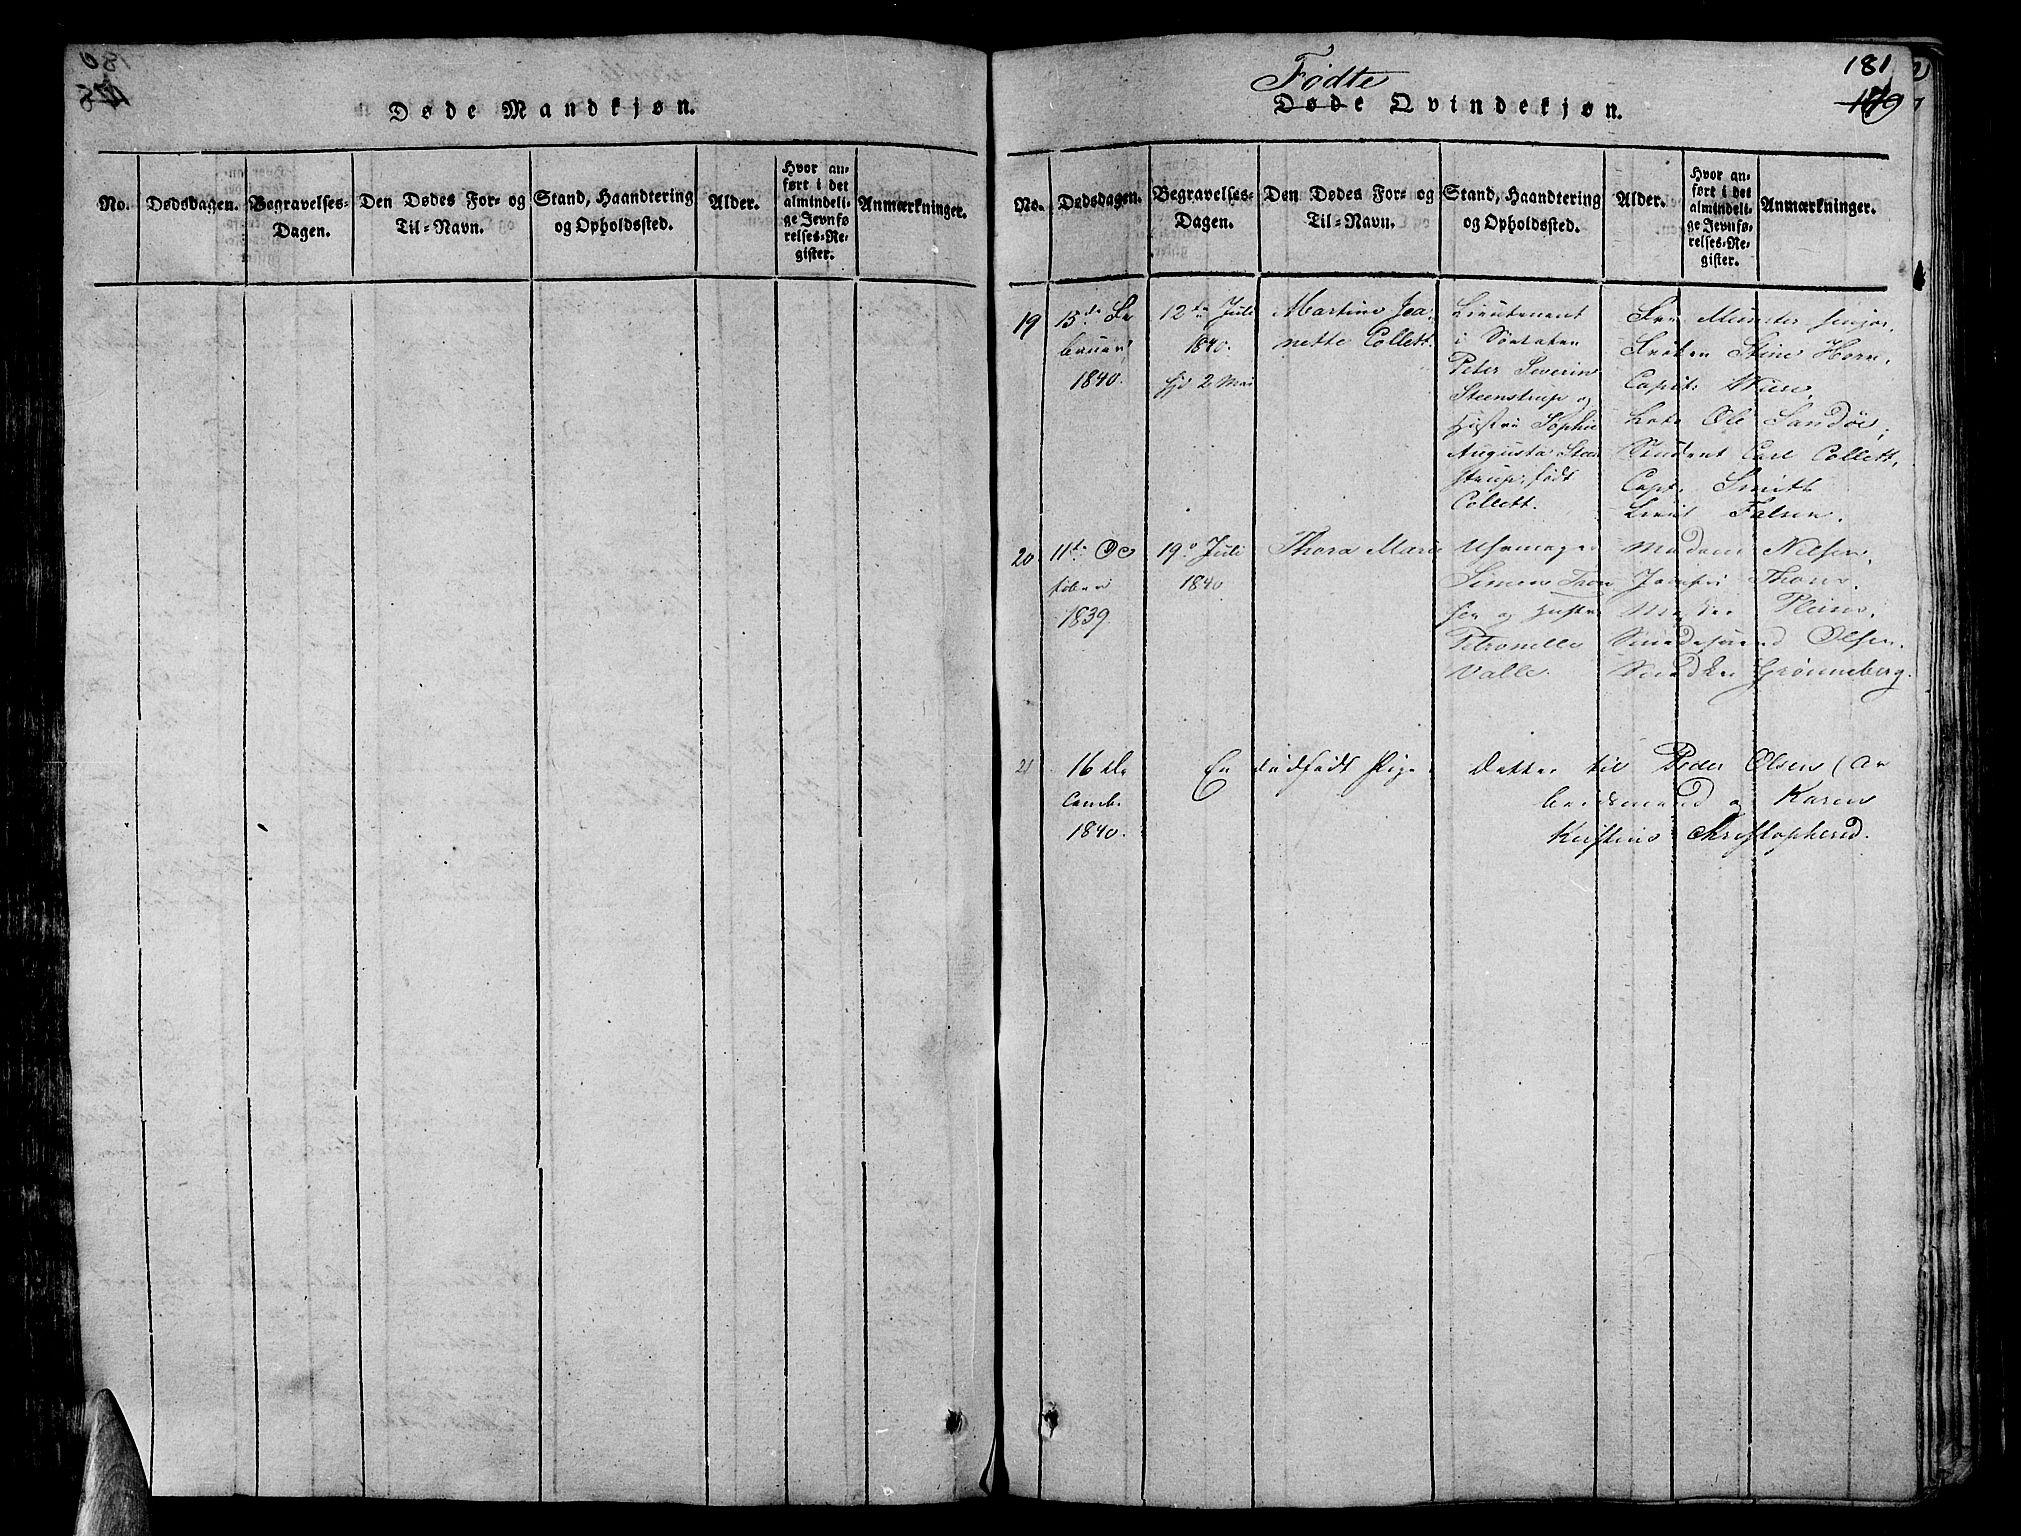 SAKO, Stavern kirkebøker, G/Ga/L0001: Klokkerbok nr. 1, 1817-1841, s. 181